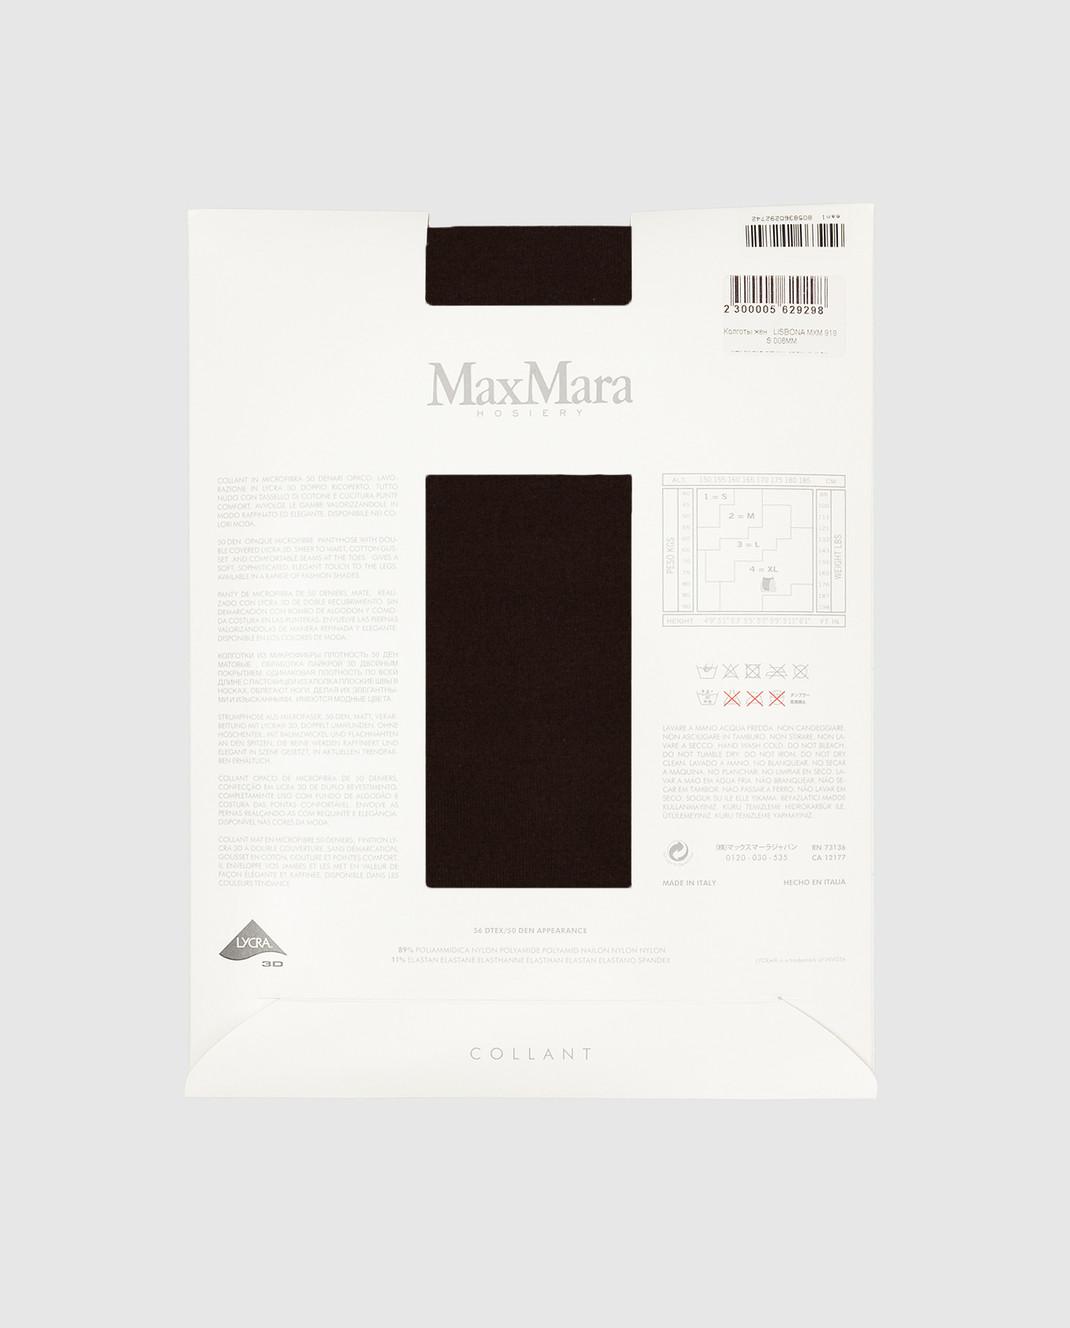 Max Mara Темно-коричневые колготы 50 ден LISBONA изображение 4